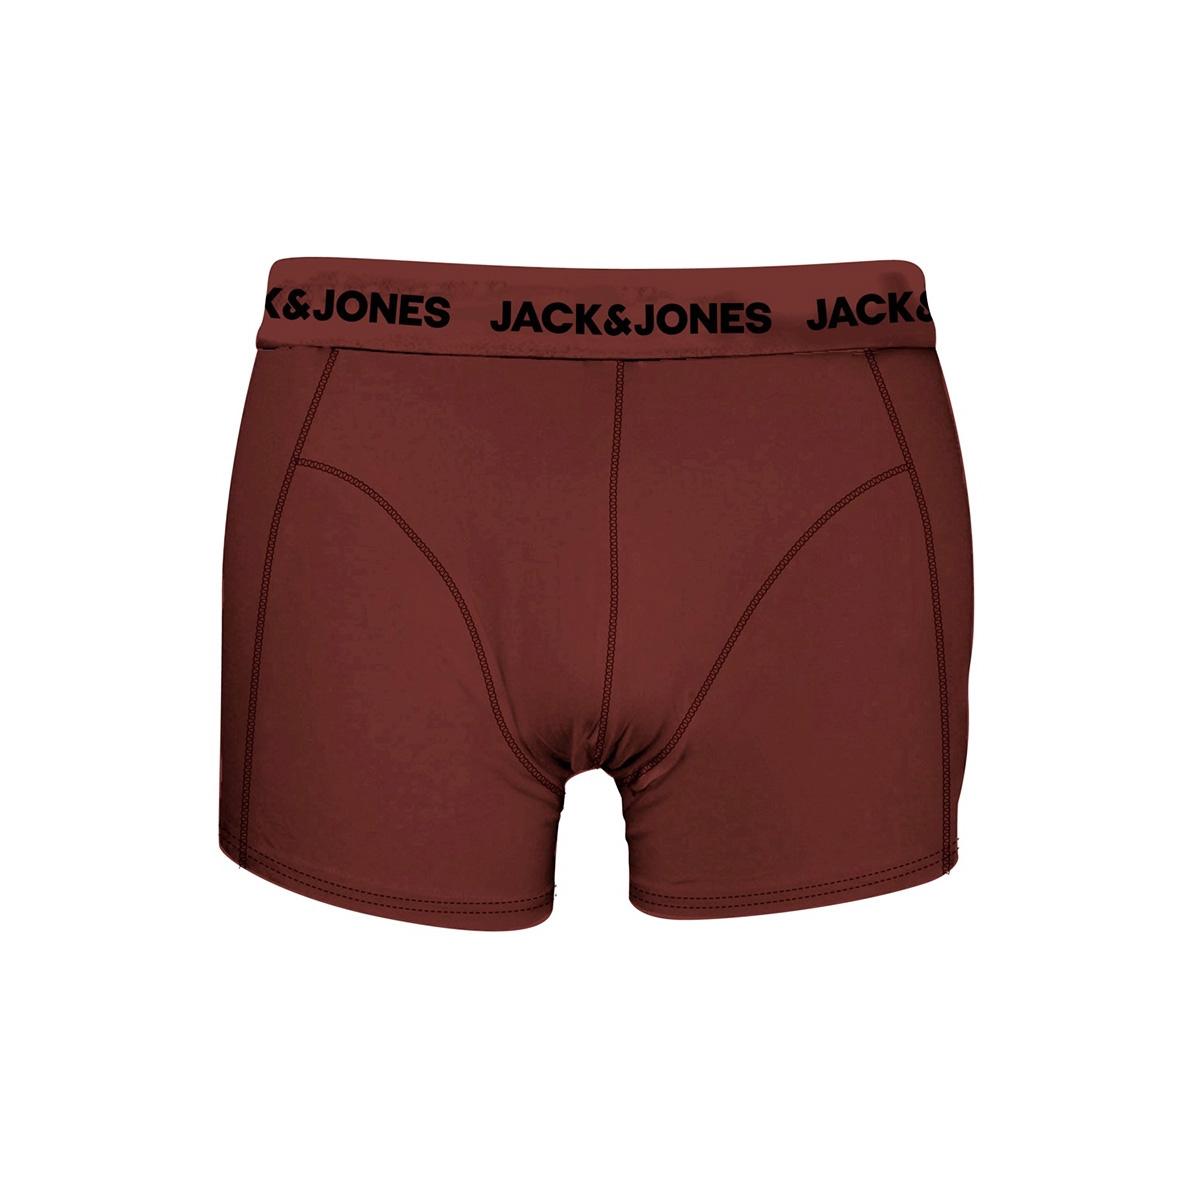 jacautumn trunks 3 pack 12161343 jack & jones ondergoed fired brick/black - ro